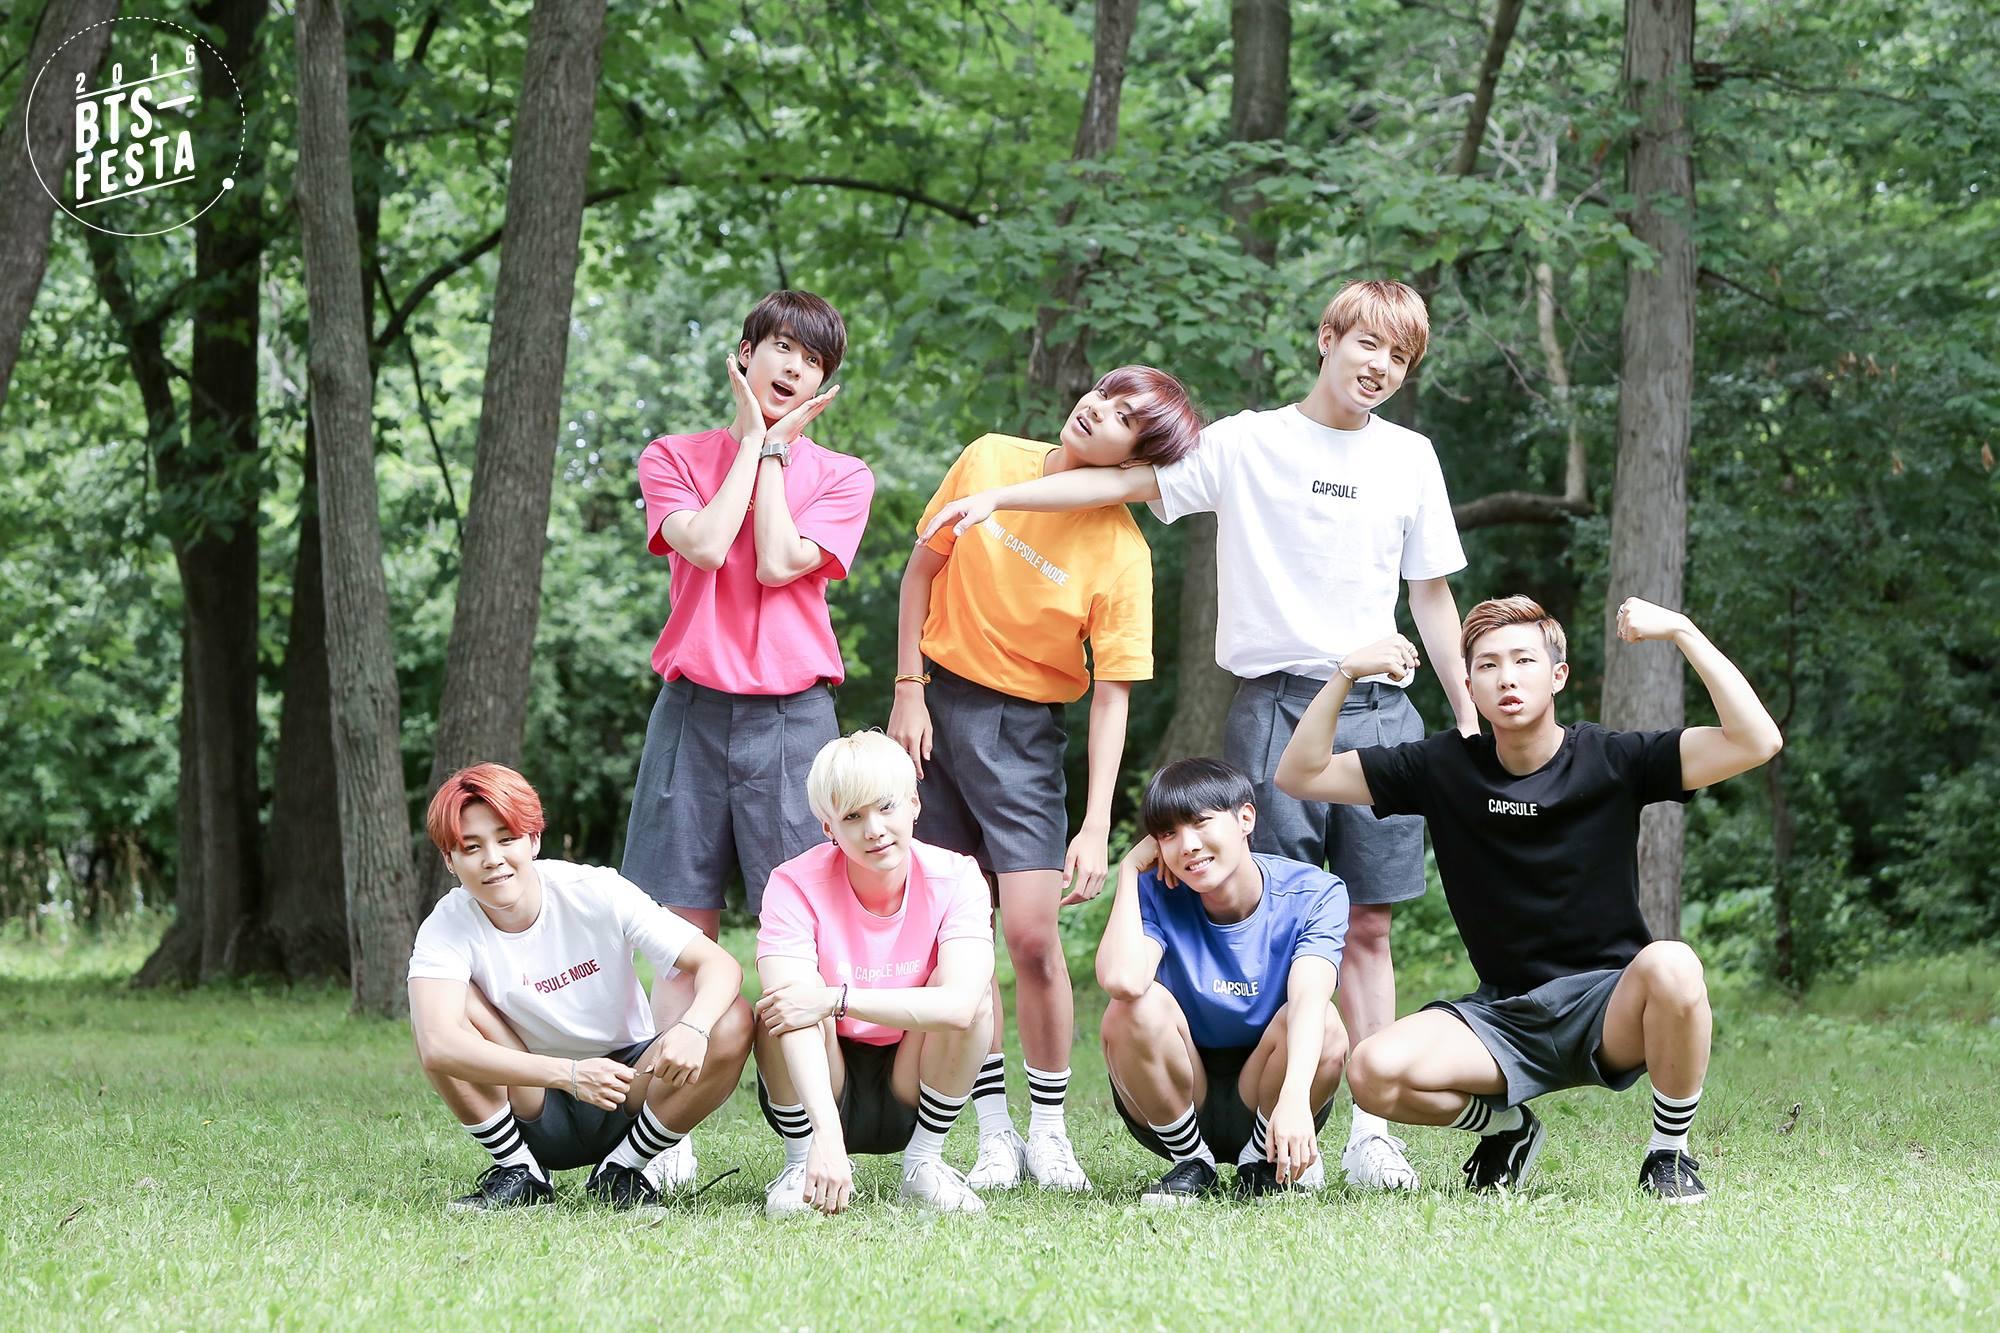 Image: BTS 3rd anniversary / Big Hit Entertainment